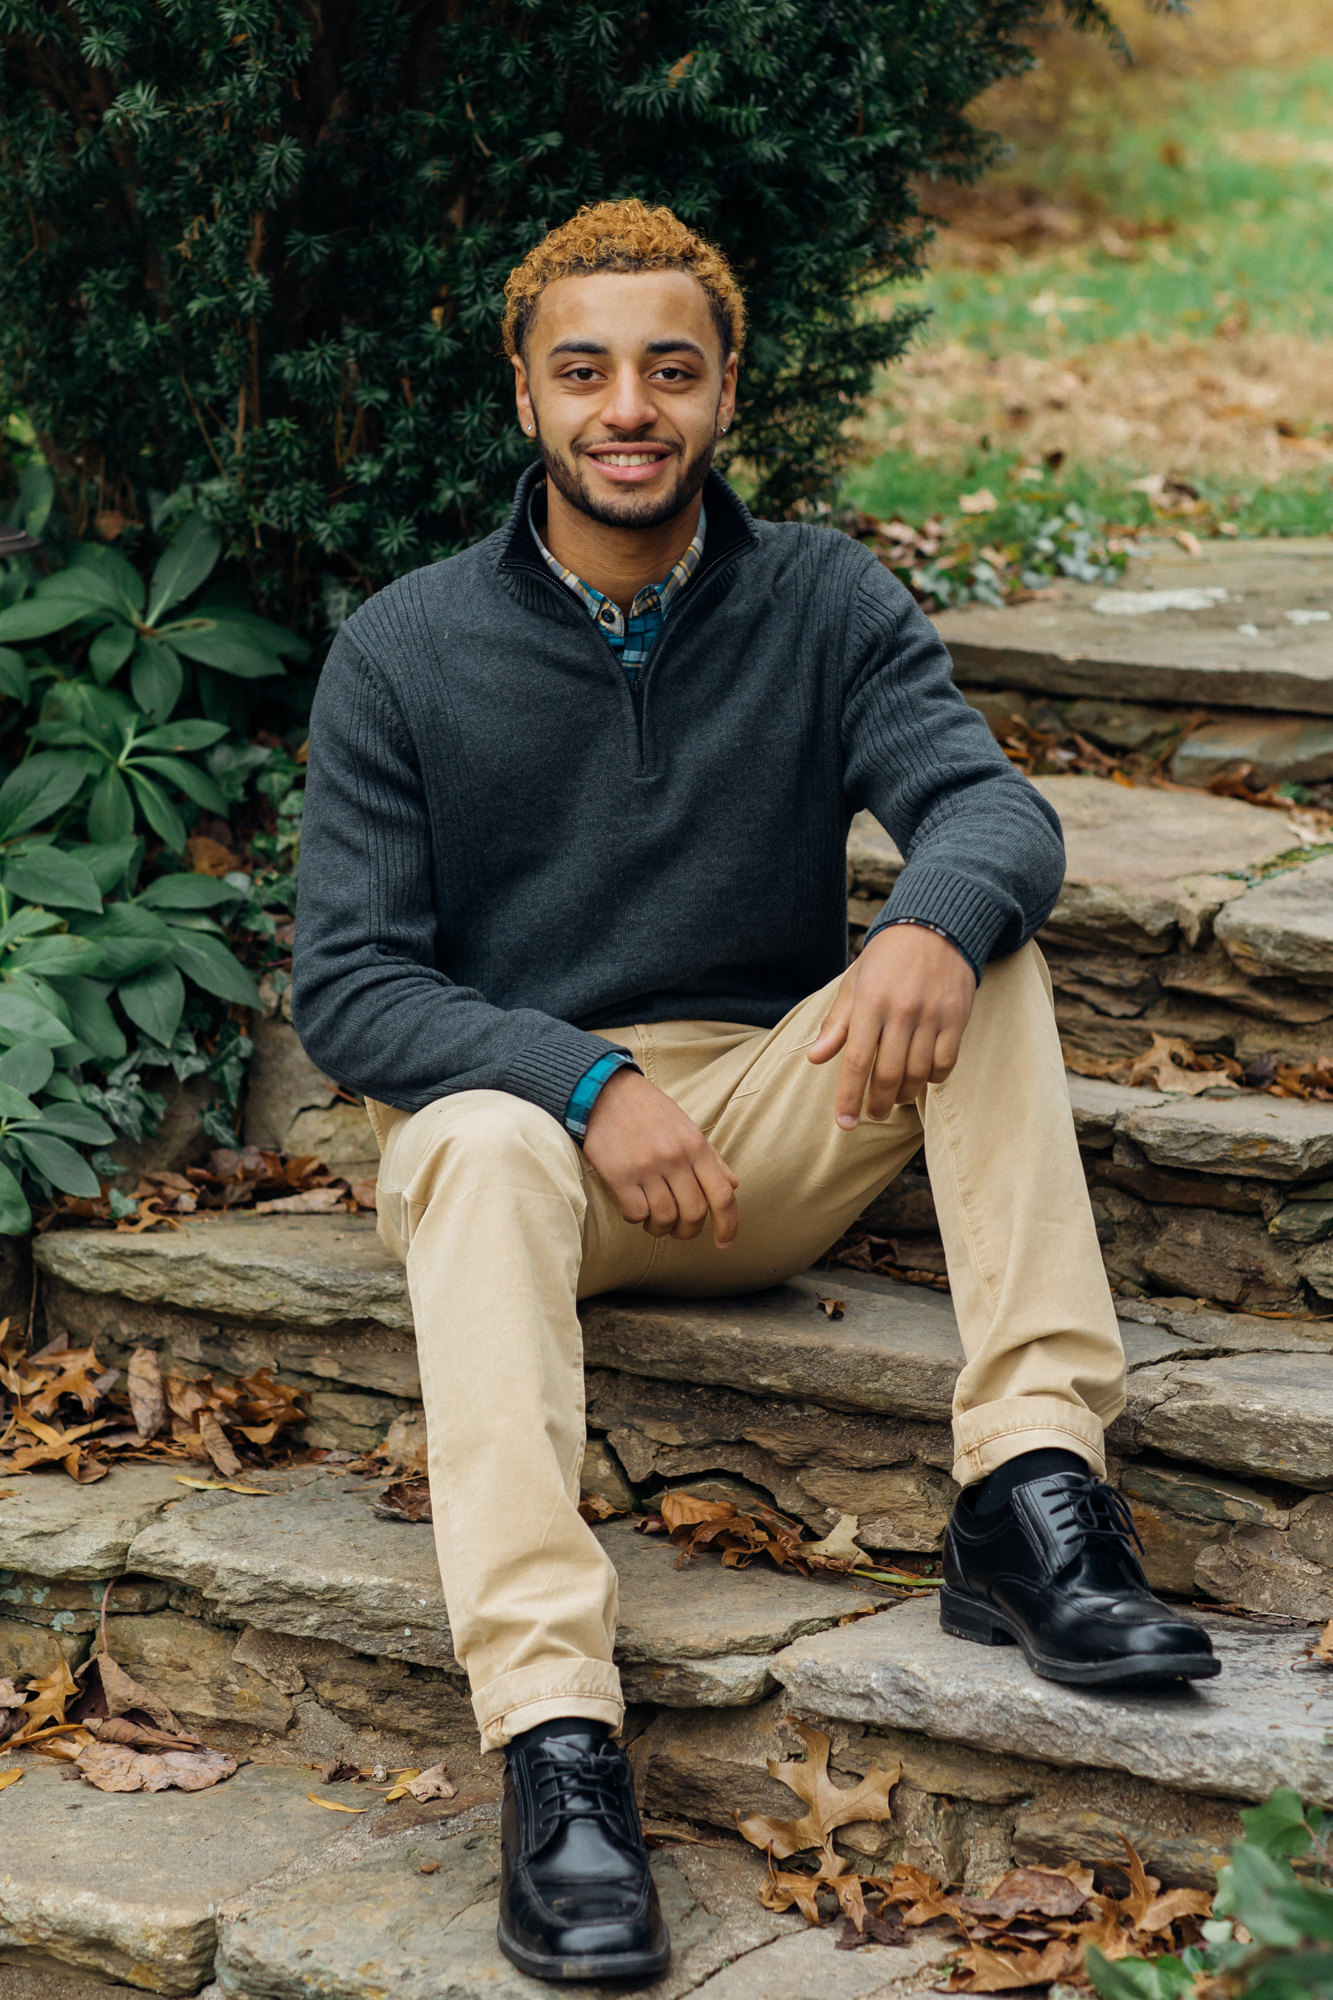 Haymarket VA High School Senior sitting on stone steps posing for portrait